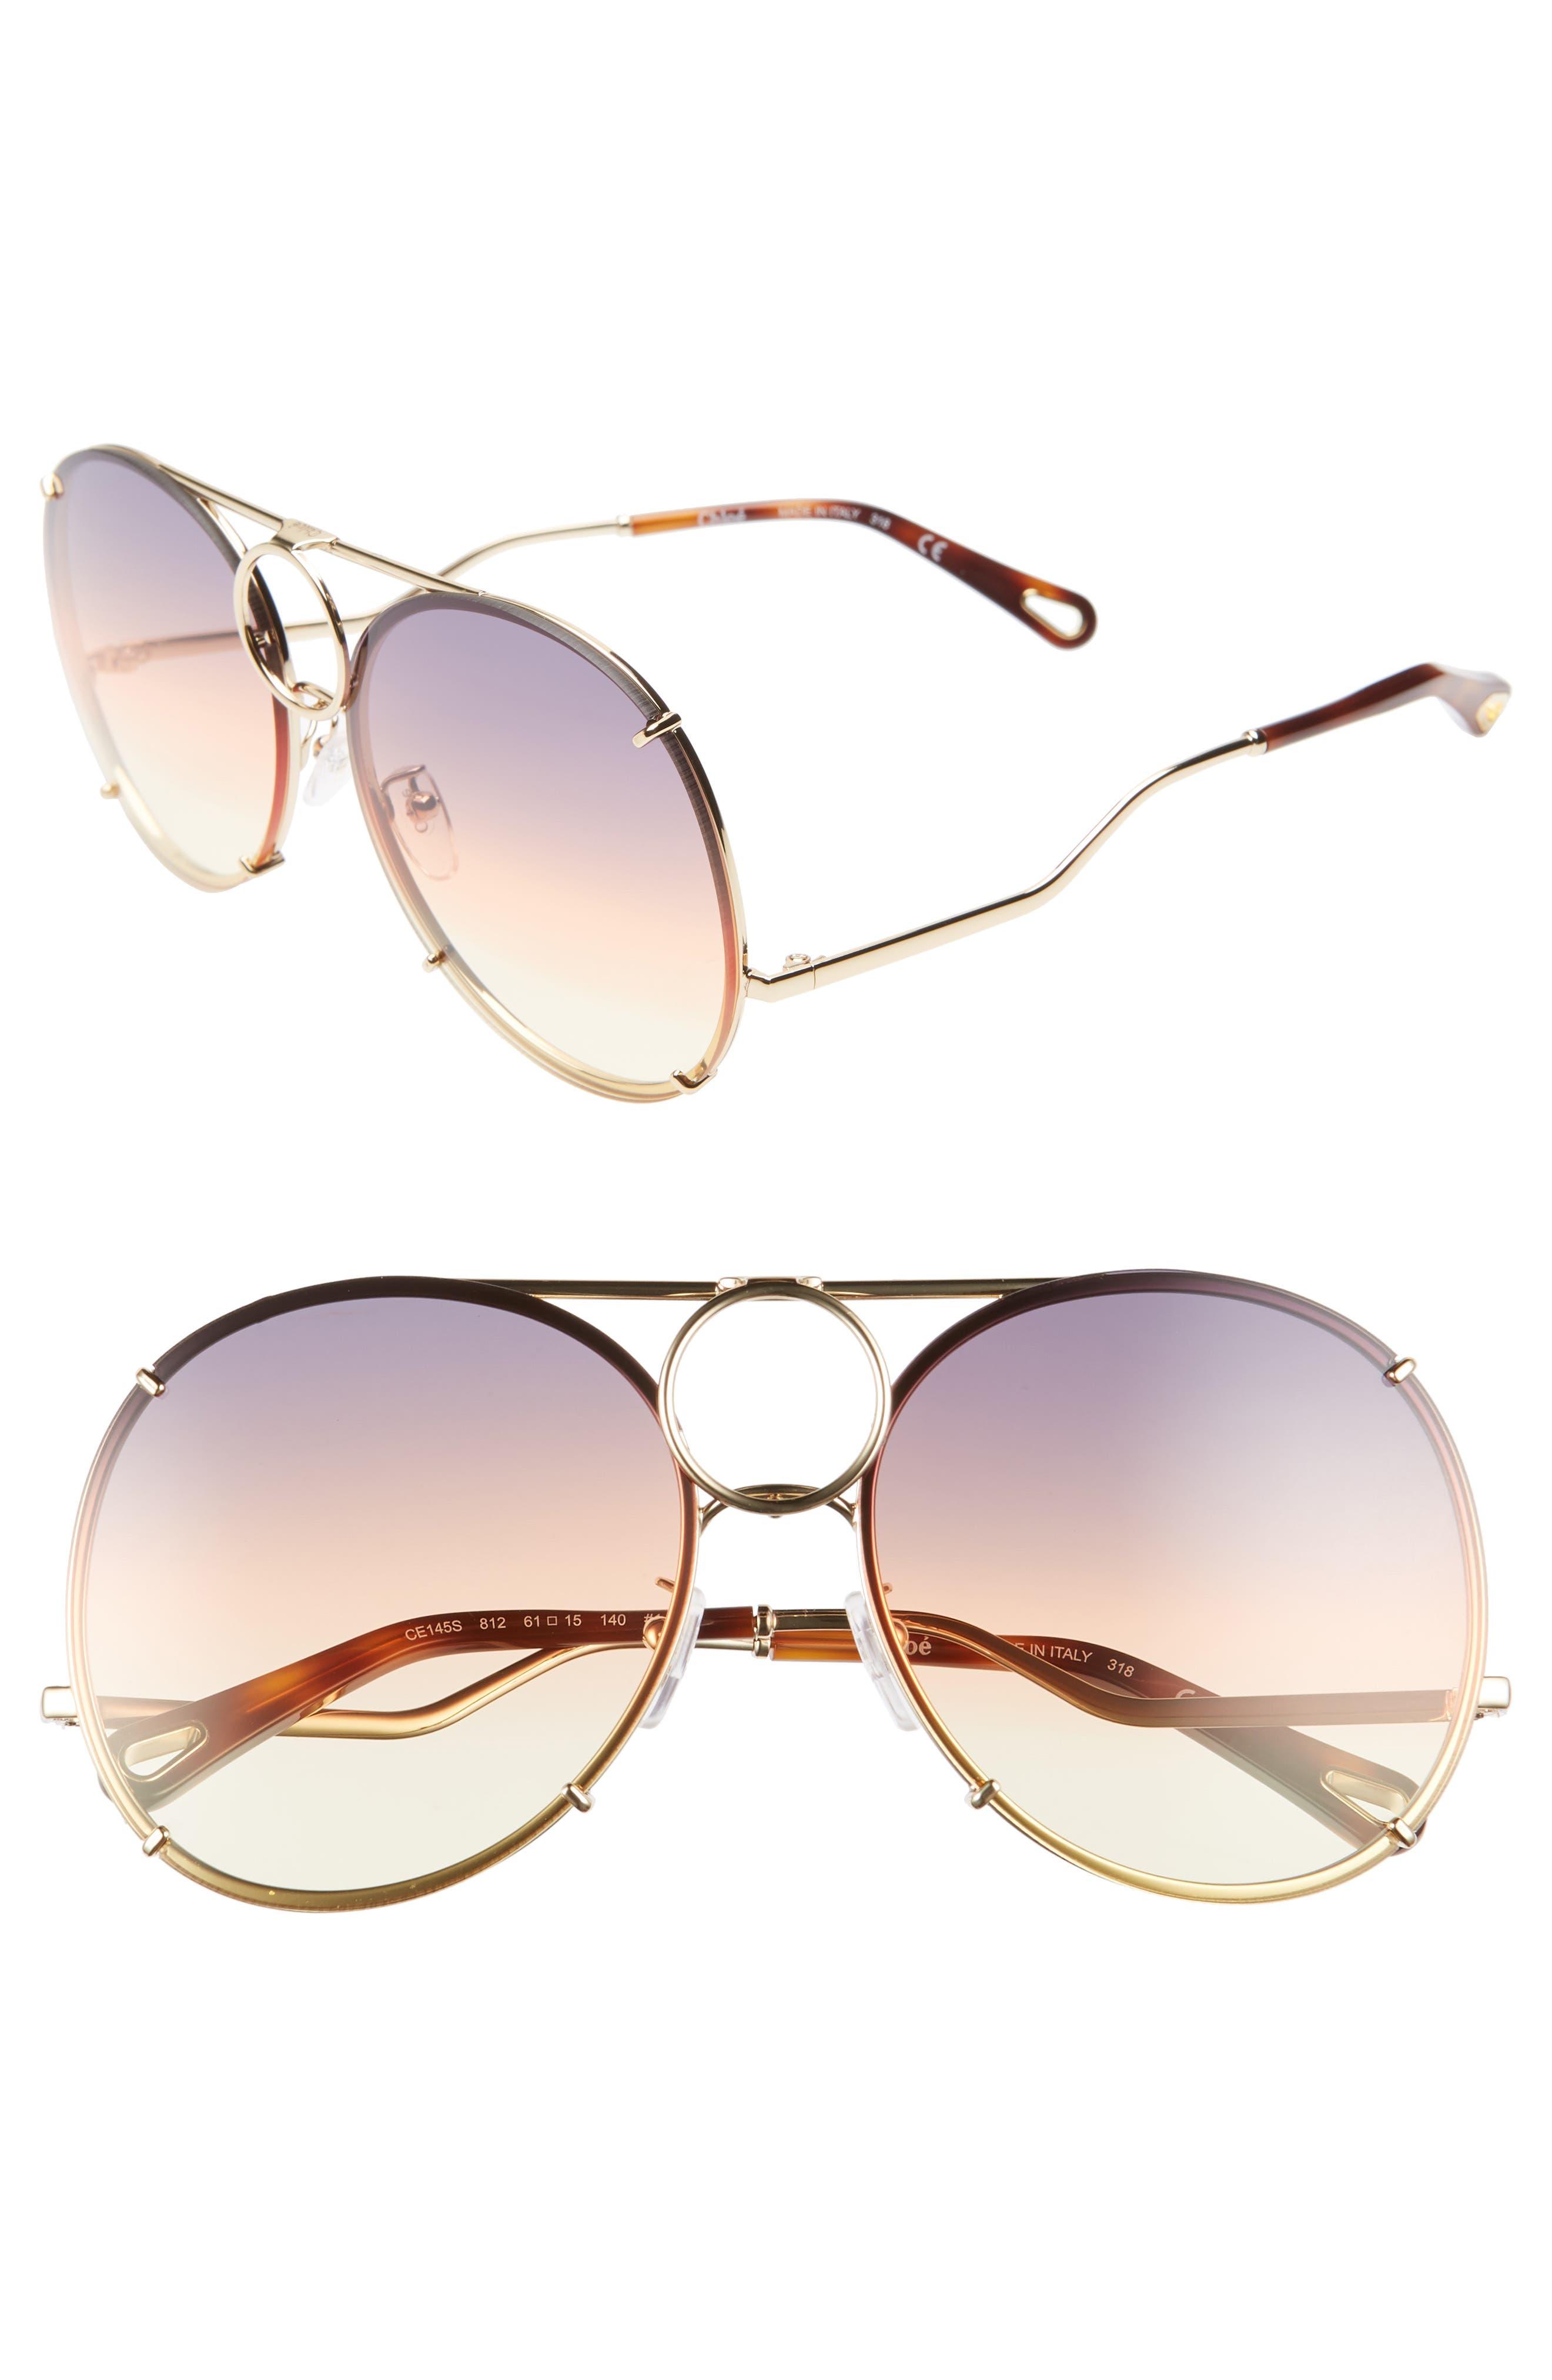 Chloé Women Nordstrom Sunglasses Chloé Sunglasses For RxYdRw